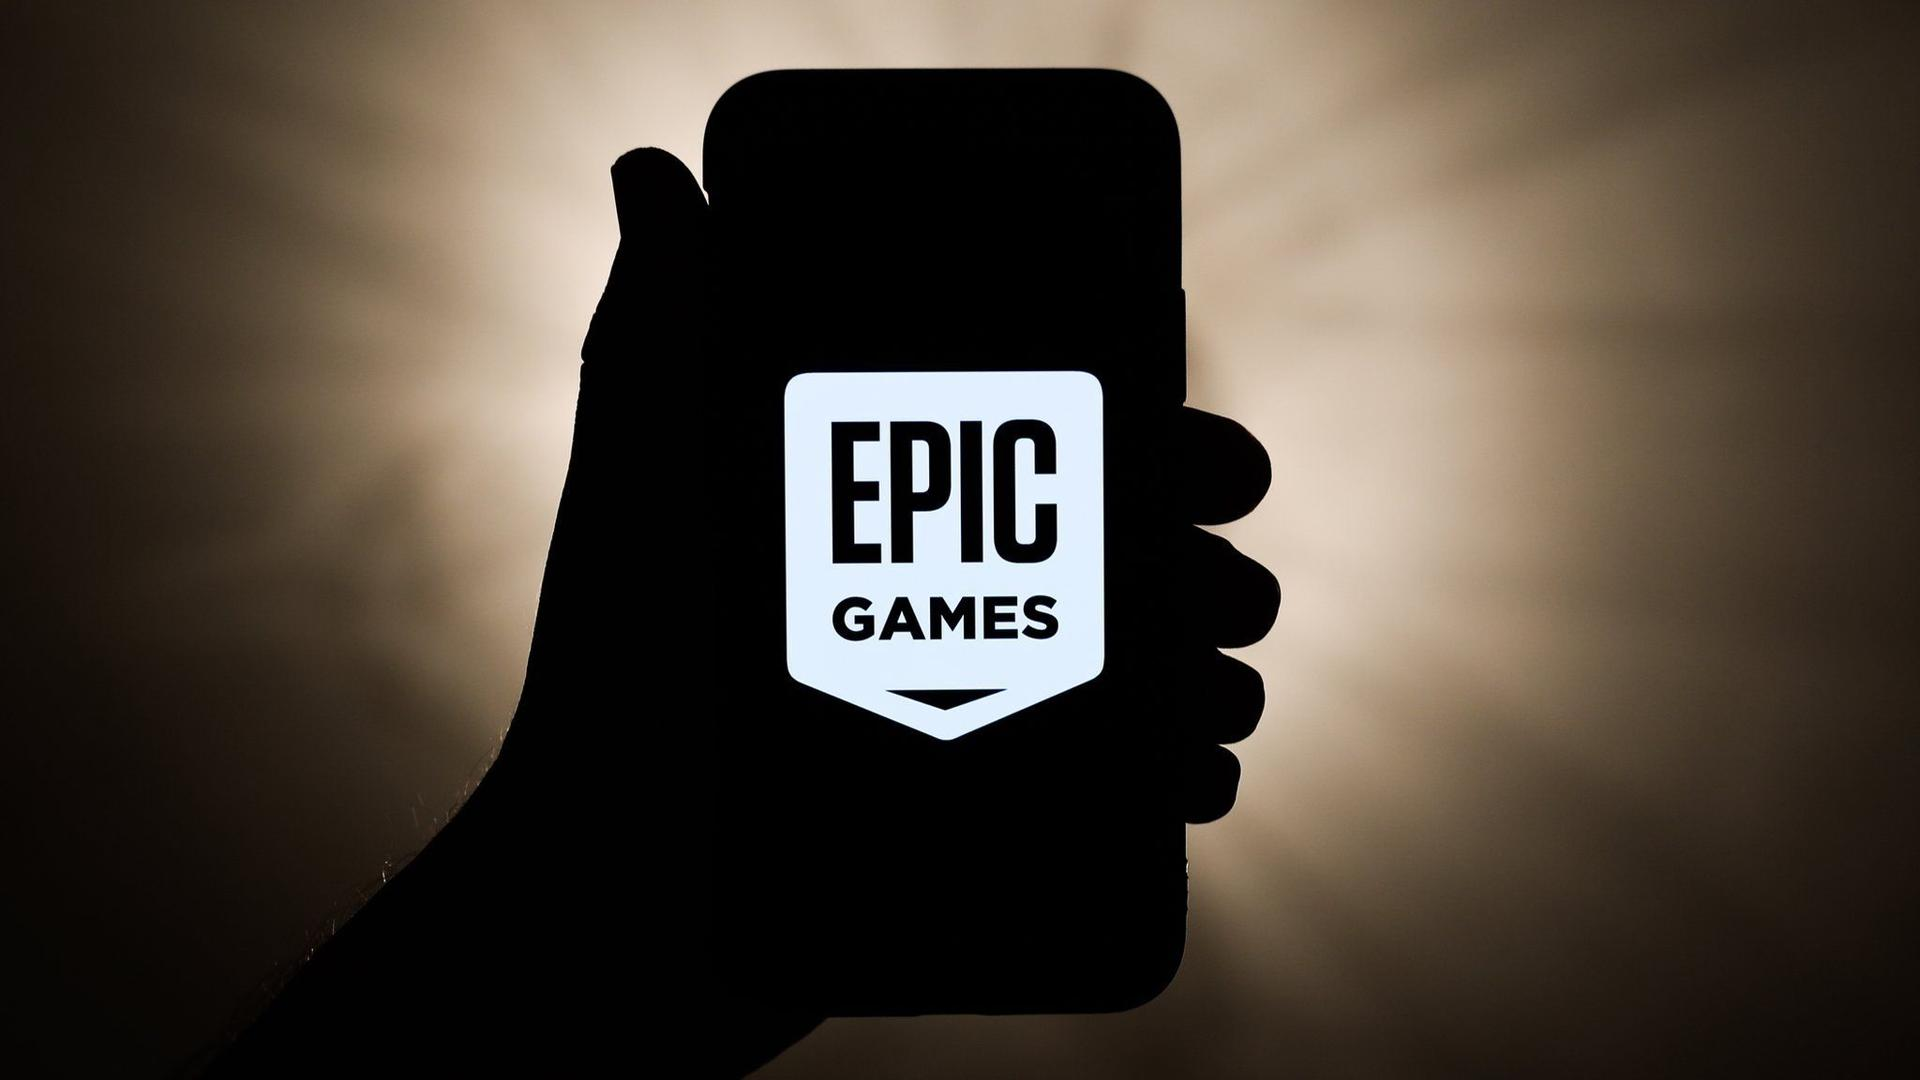 Apple dealt major blow in Epic Games trial